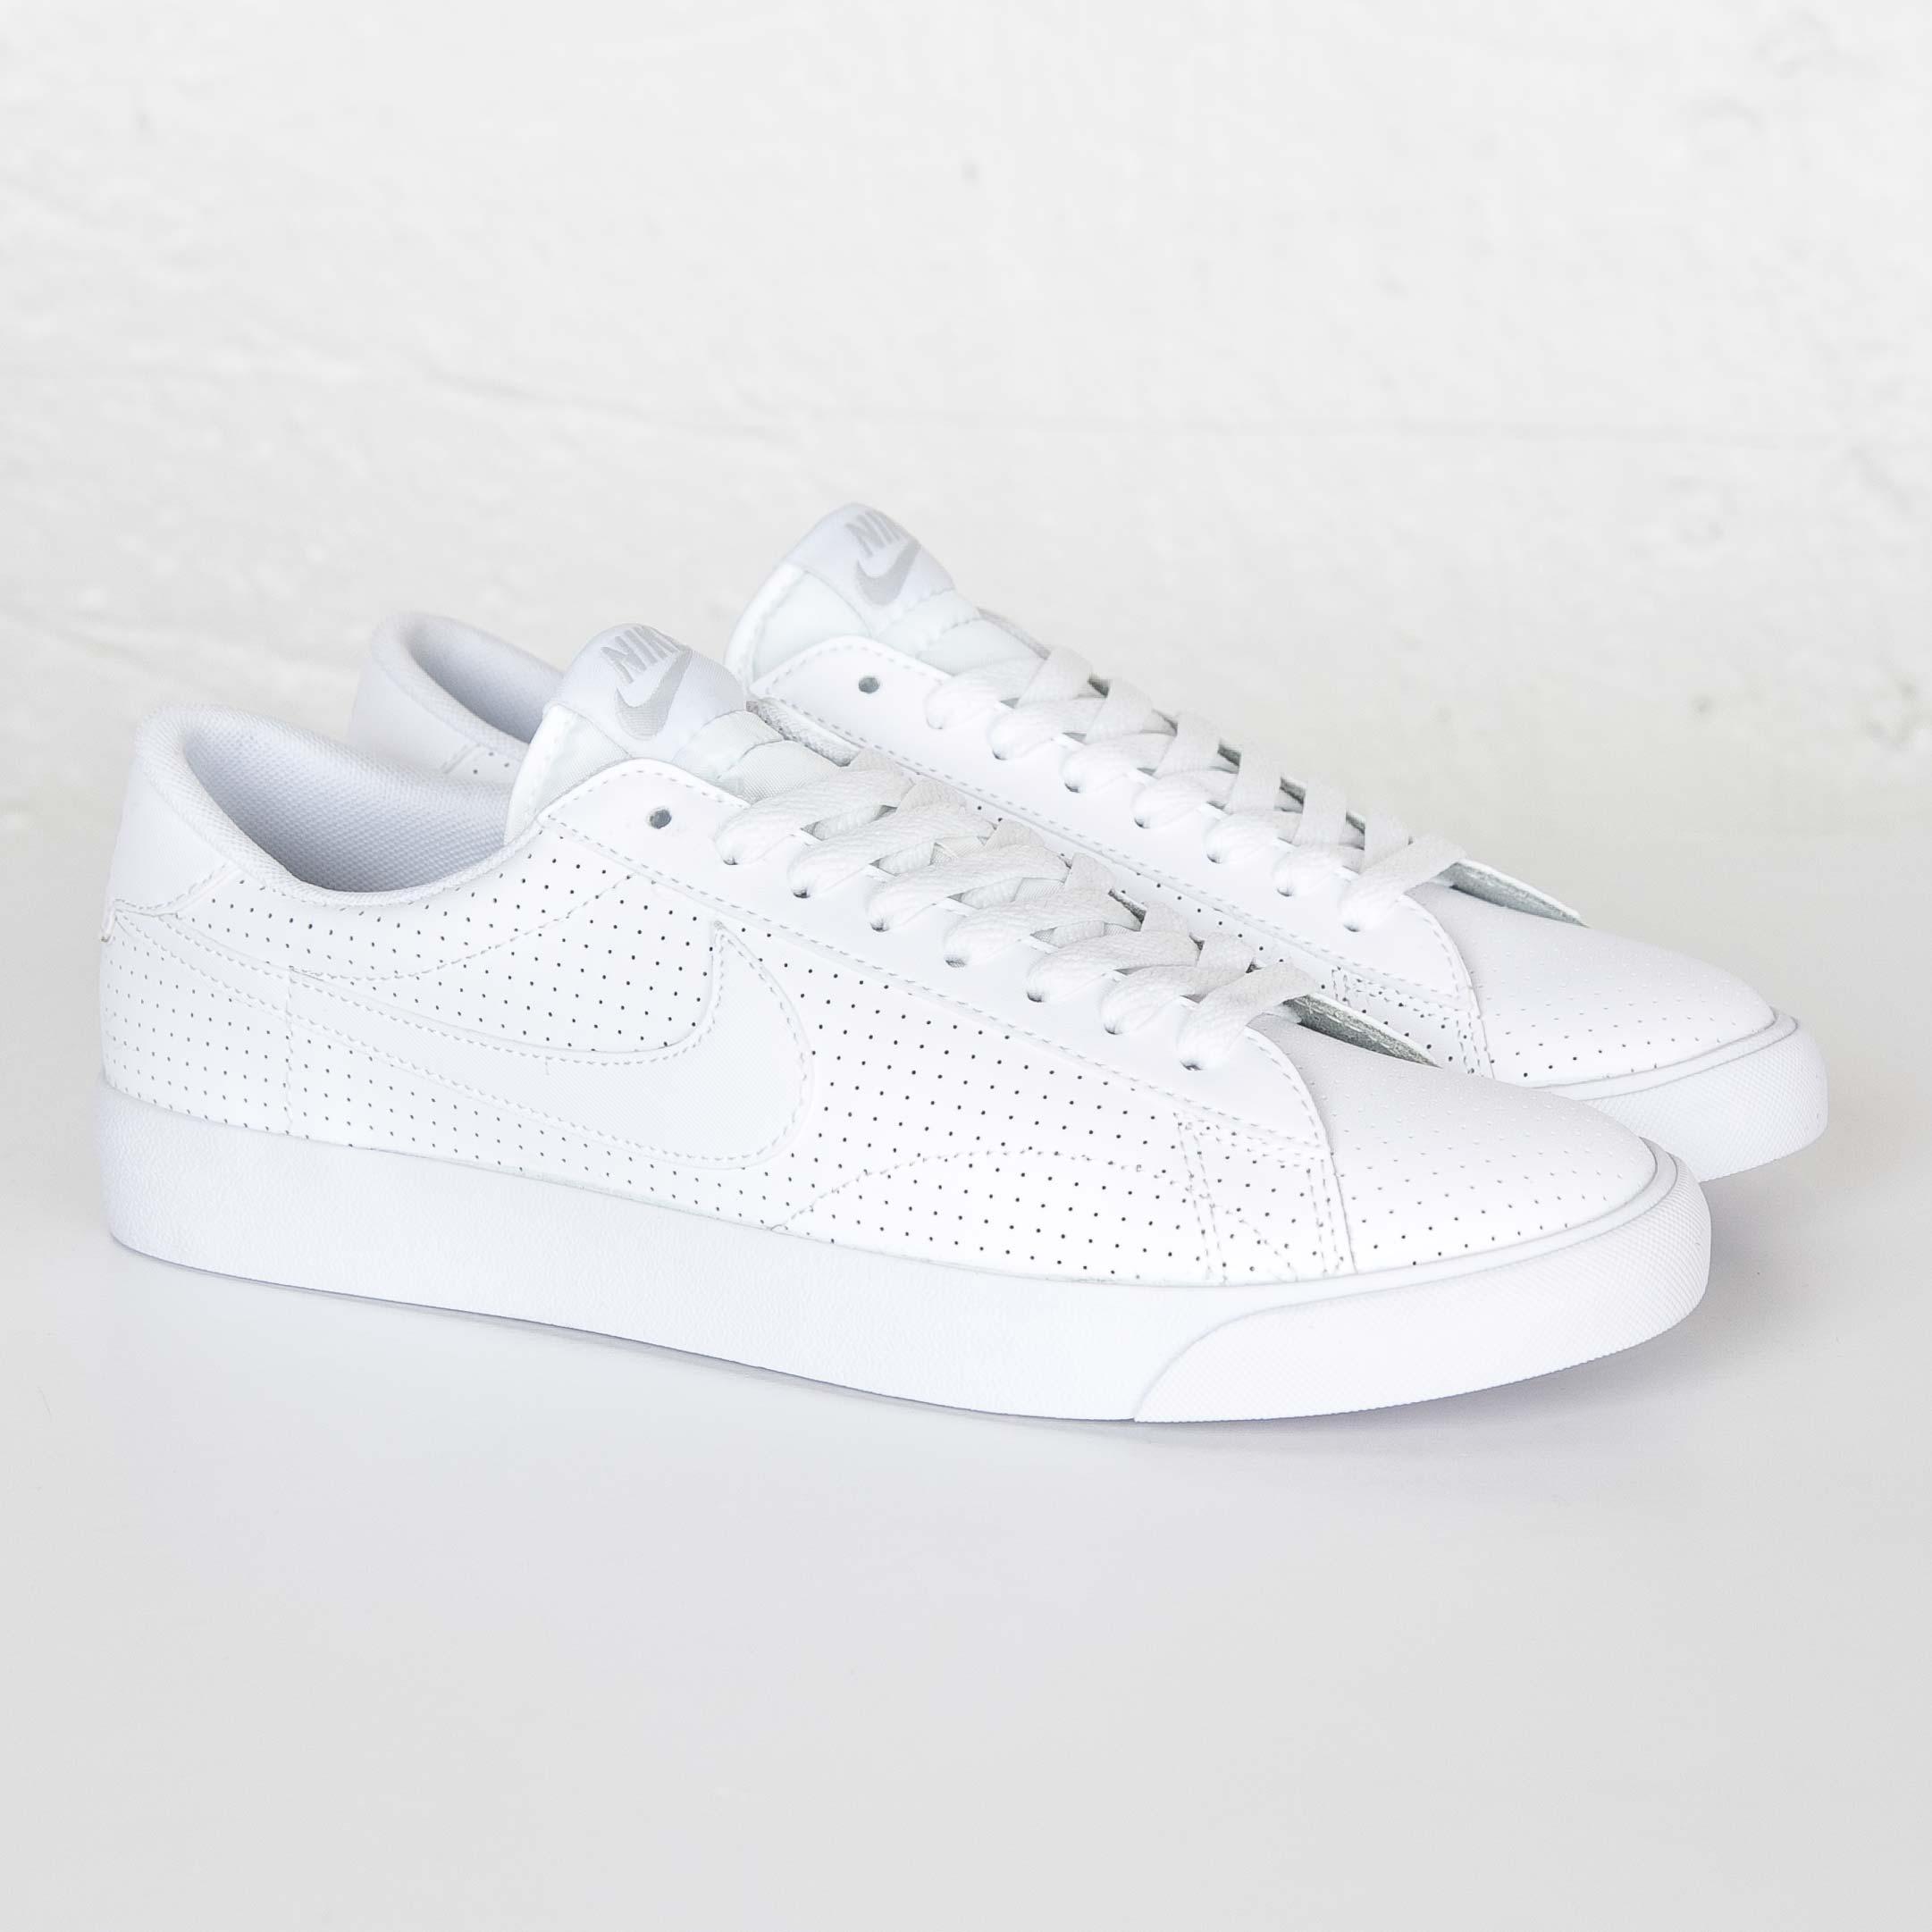 separation shoes 644ce e9eb9 Nike Tennis Classic AC ND